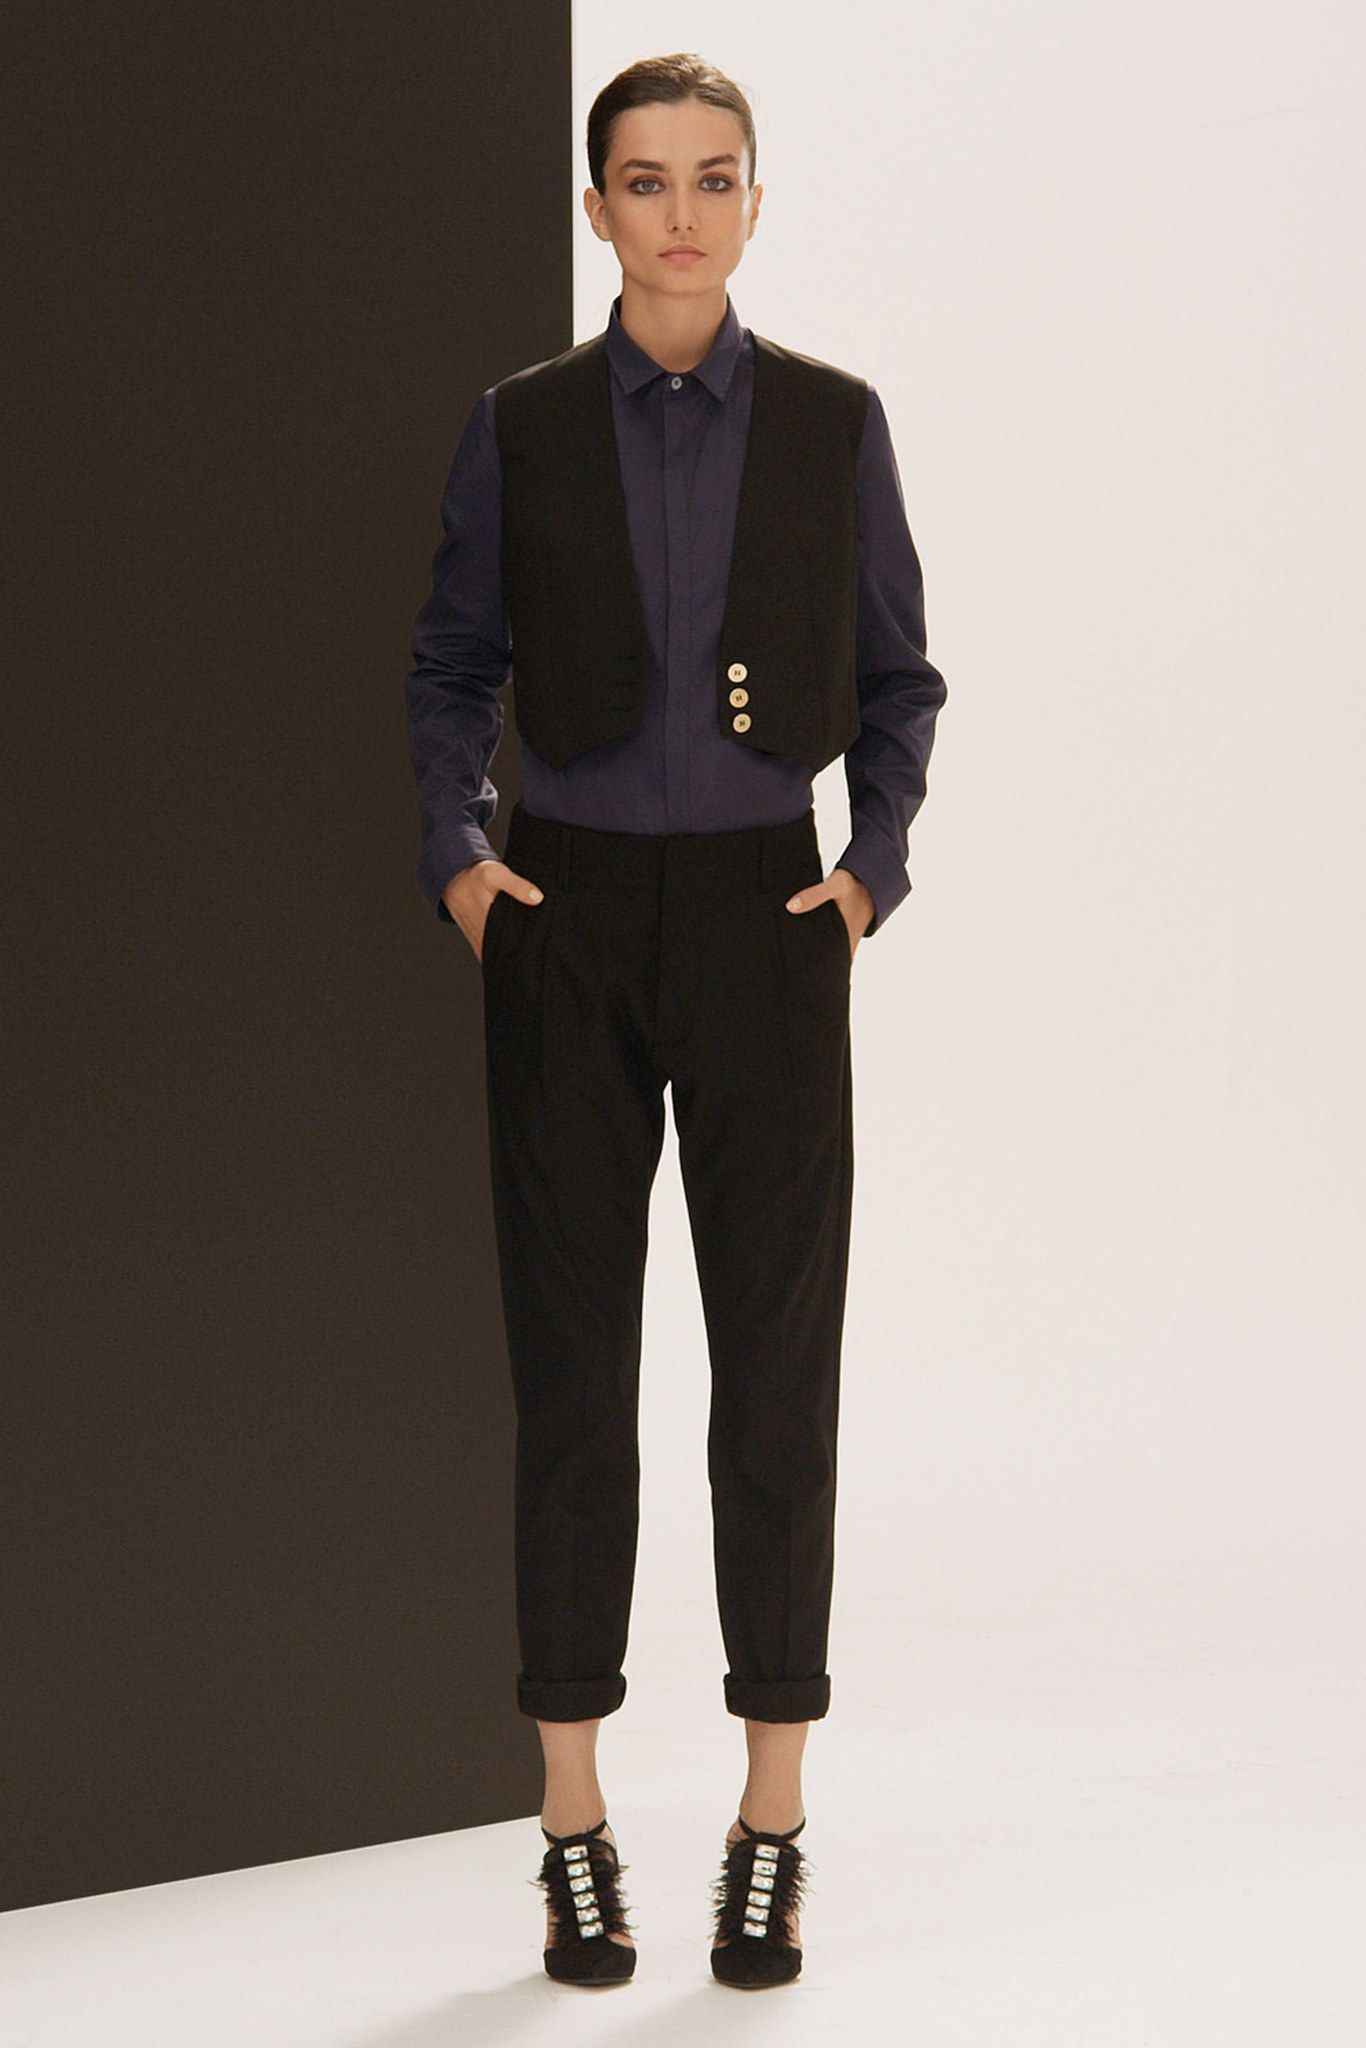 Watch Pierre Balmain FallWinter 2013-2014 RTW – New York Fashion Week video